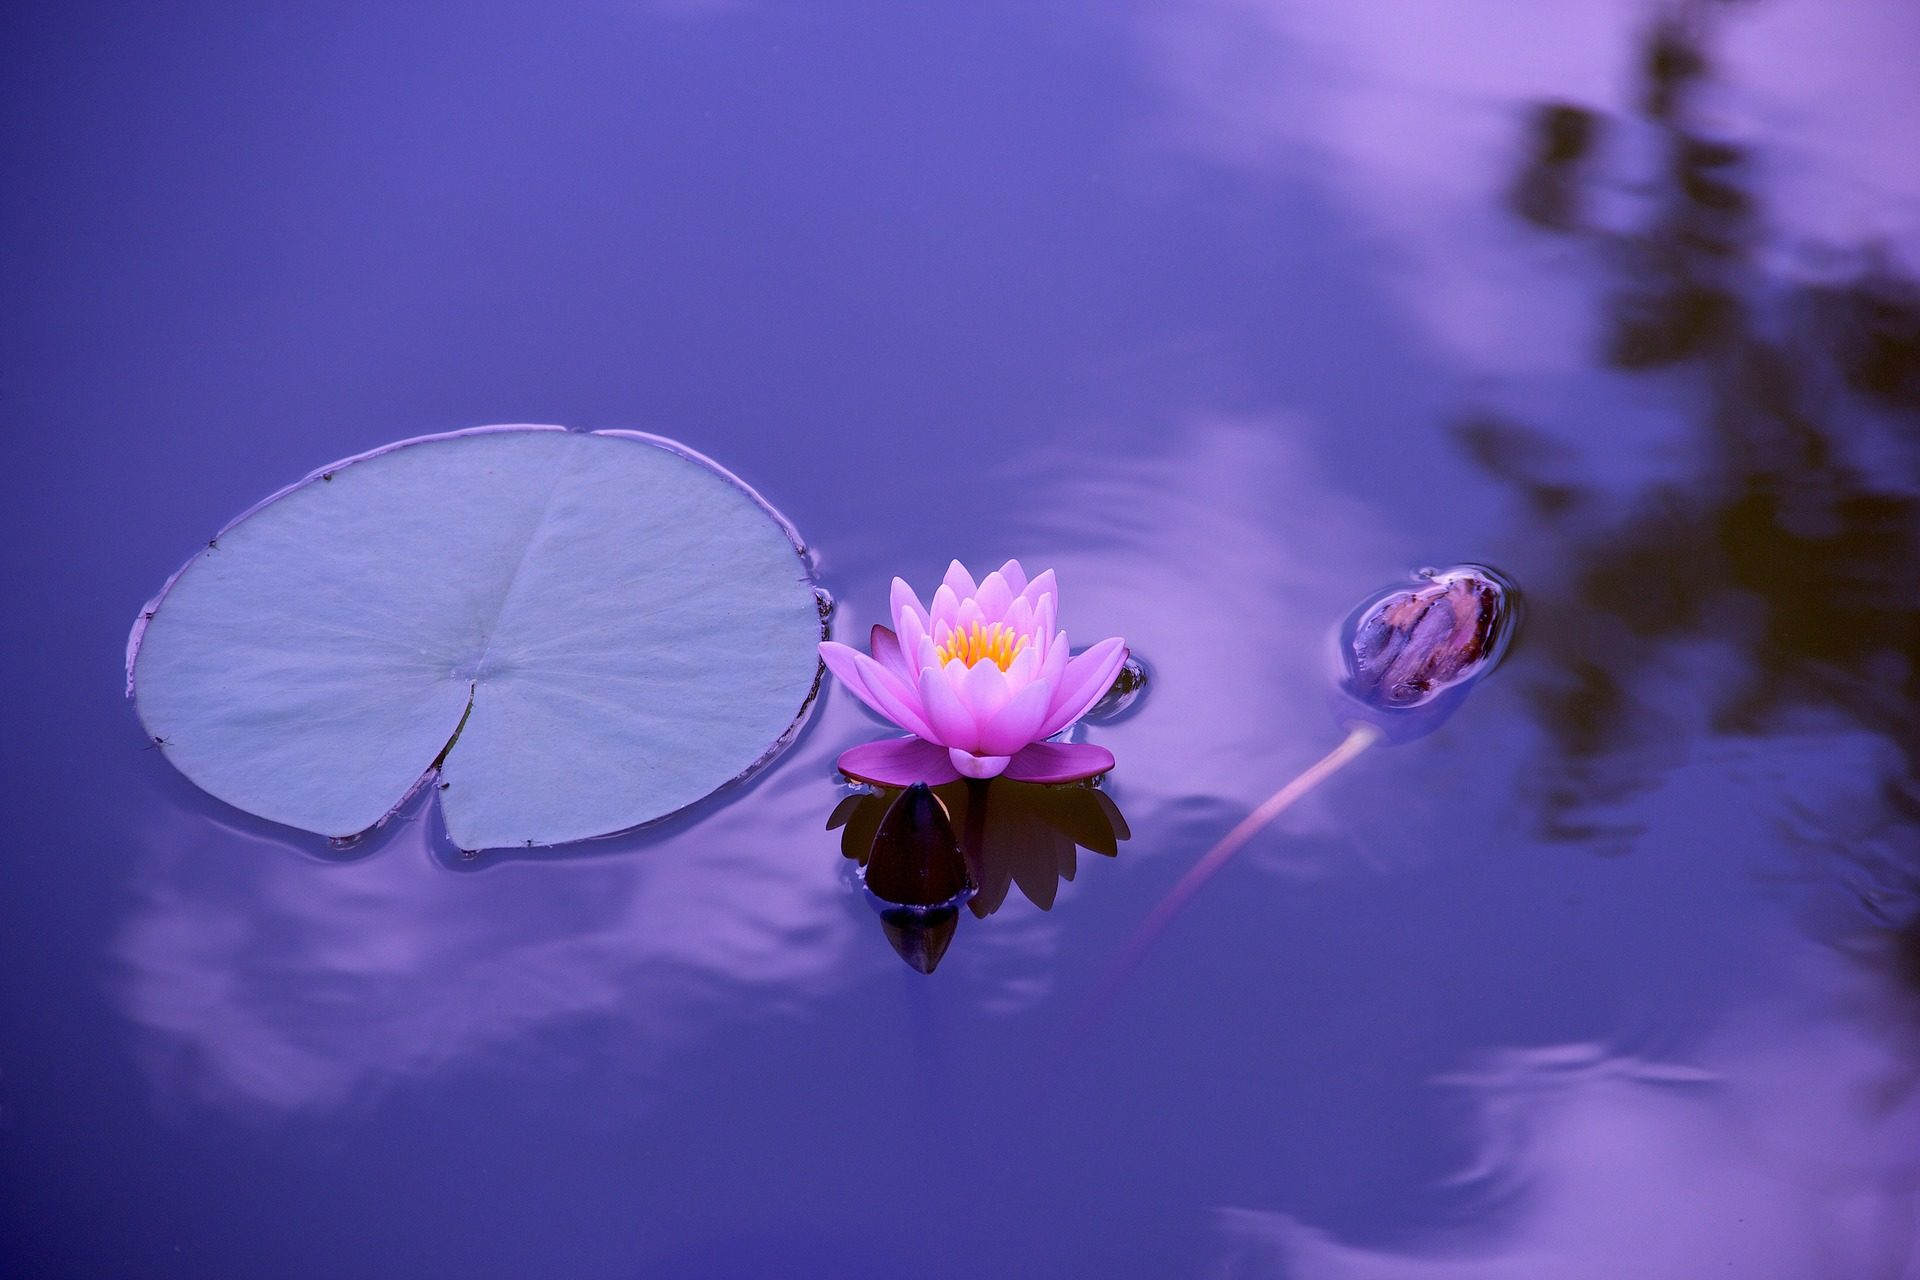 flor, loto, nenúfar, charca, jardín, zen, yoga, meditación - Fondos de Pantalla HD - professor-falken.com